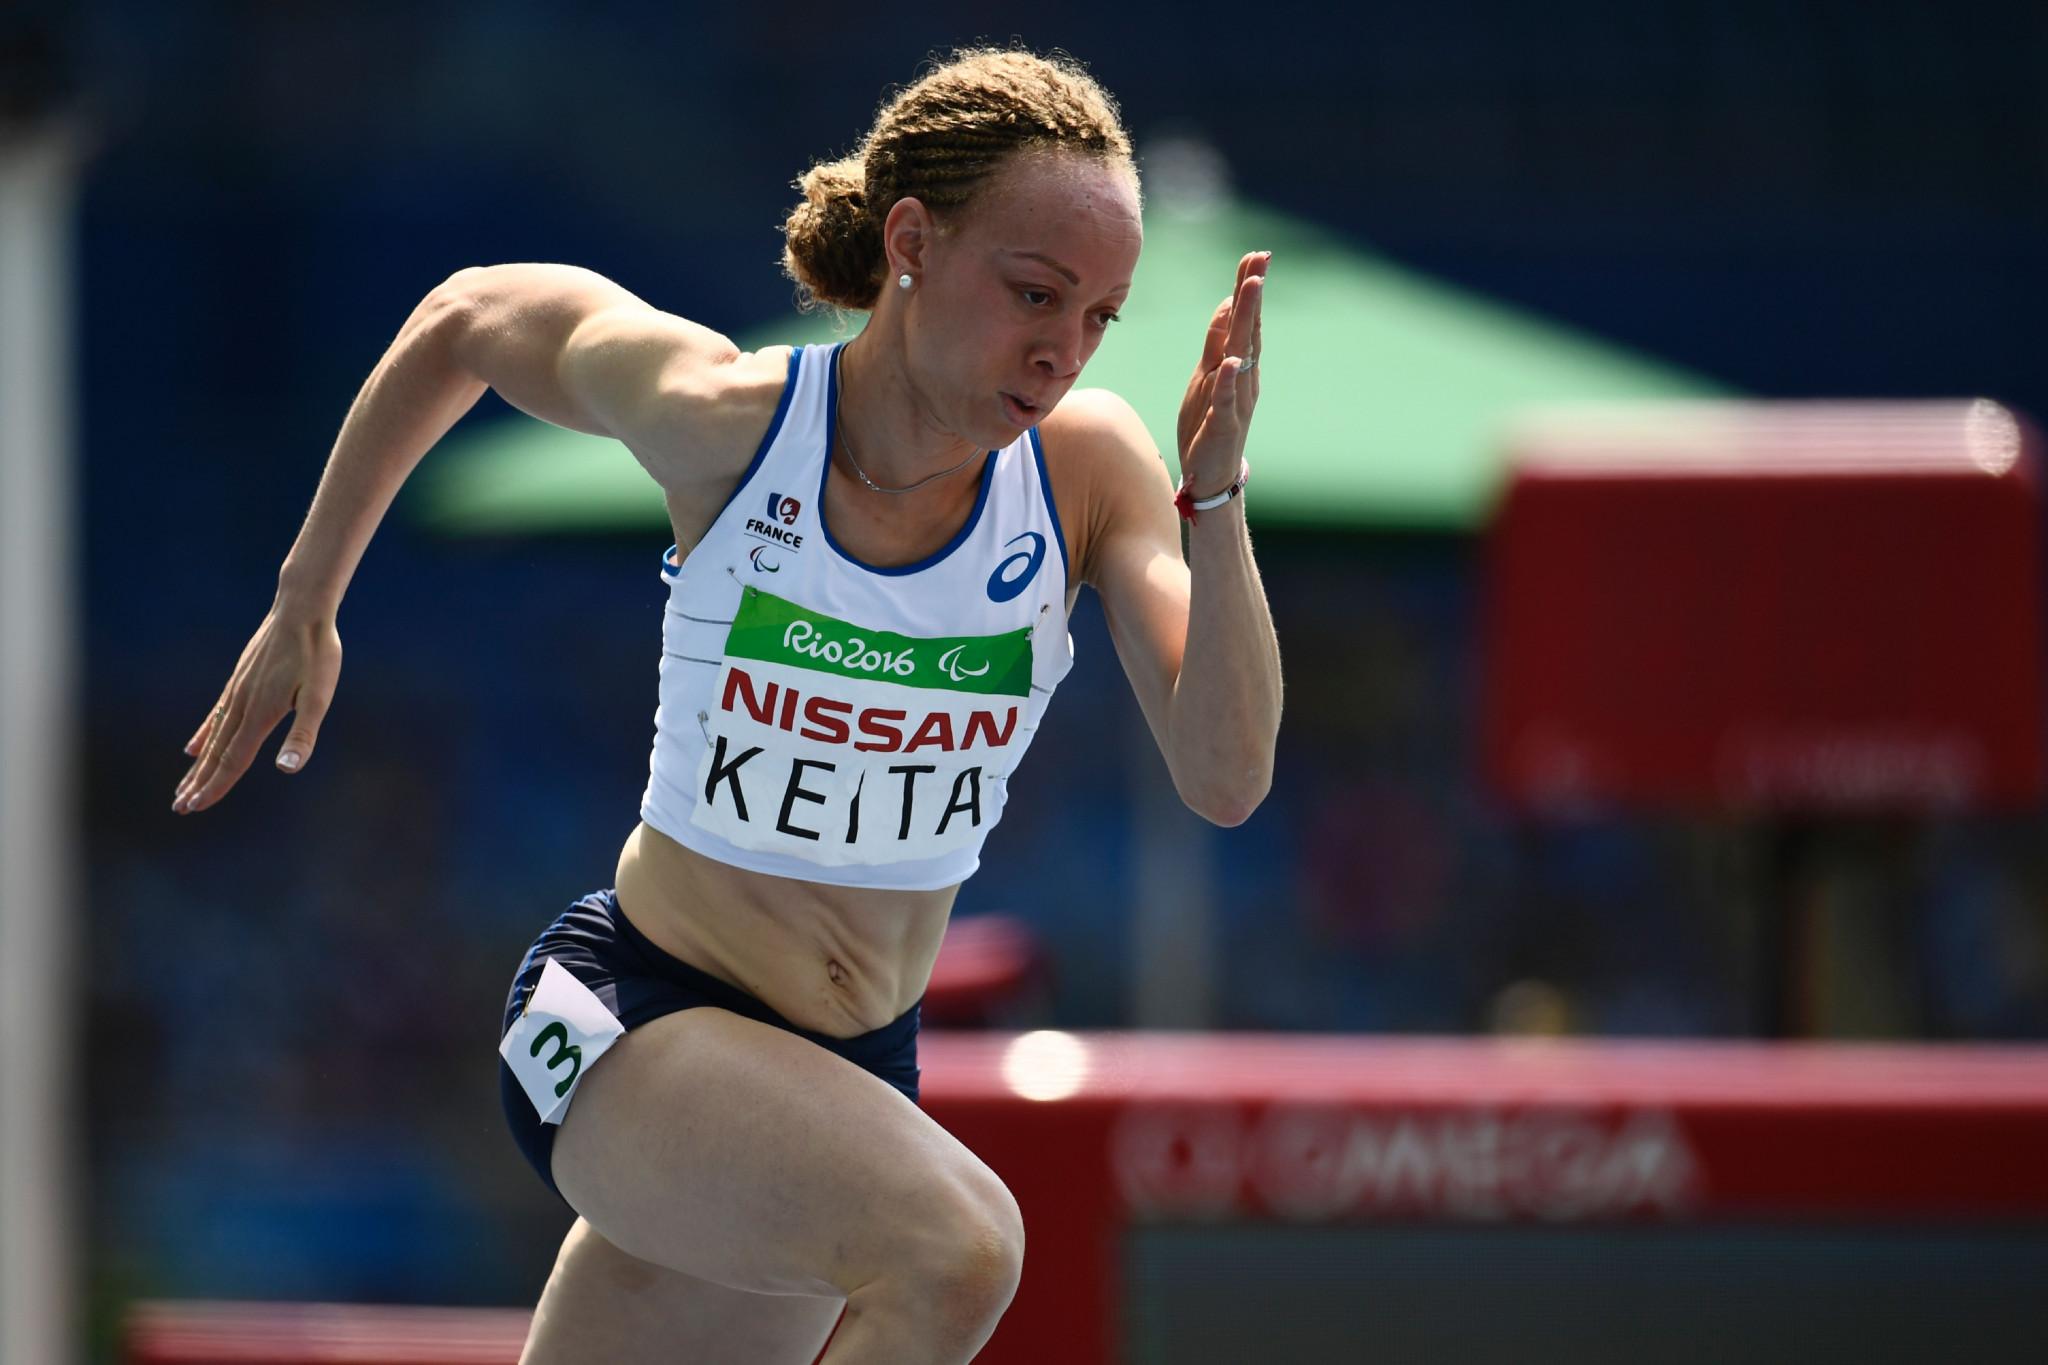 Rio 2016 gold medallist Nantenin Keita will compete at Tokyo 2020 ©Getty Images